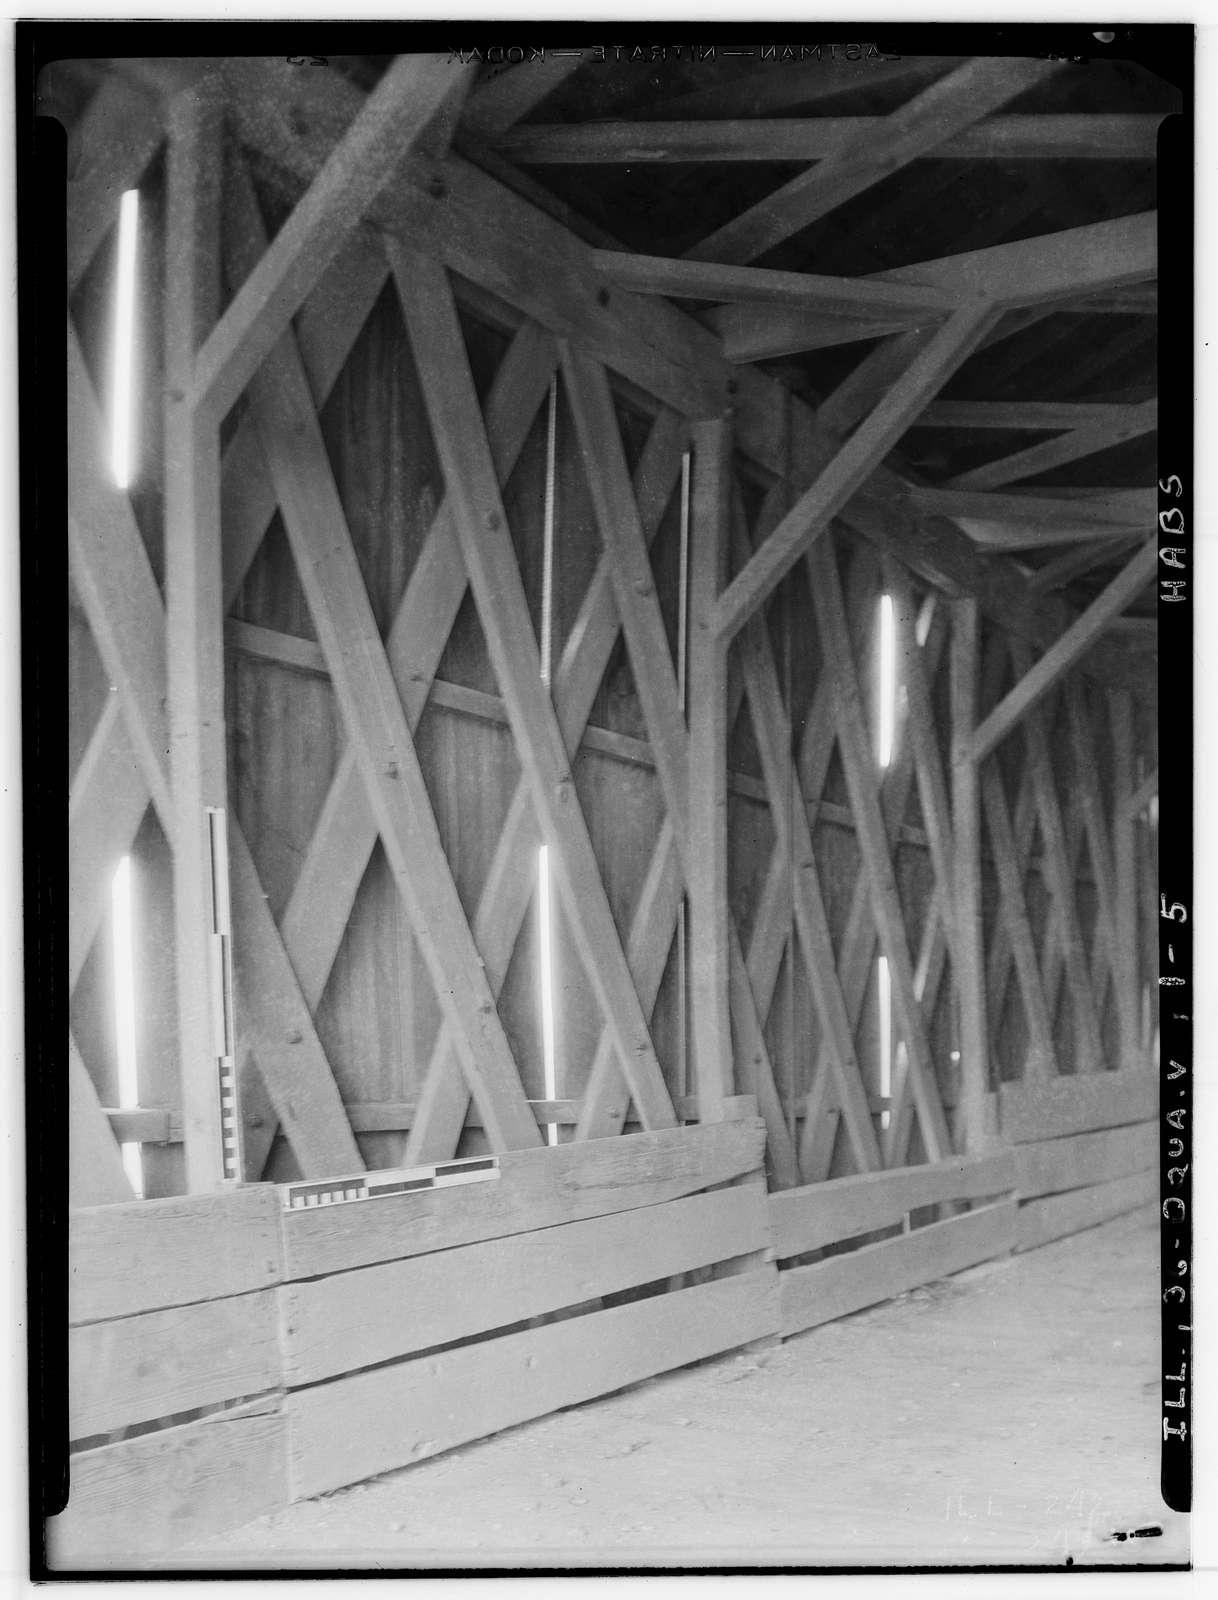 Jack's Mill Covered Bridge, Spanning Henderson Creek, Oquawka, Henderson County, IL